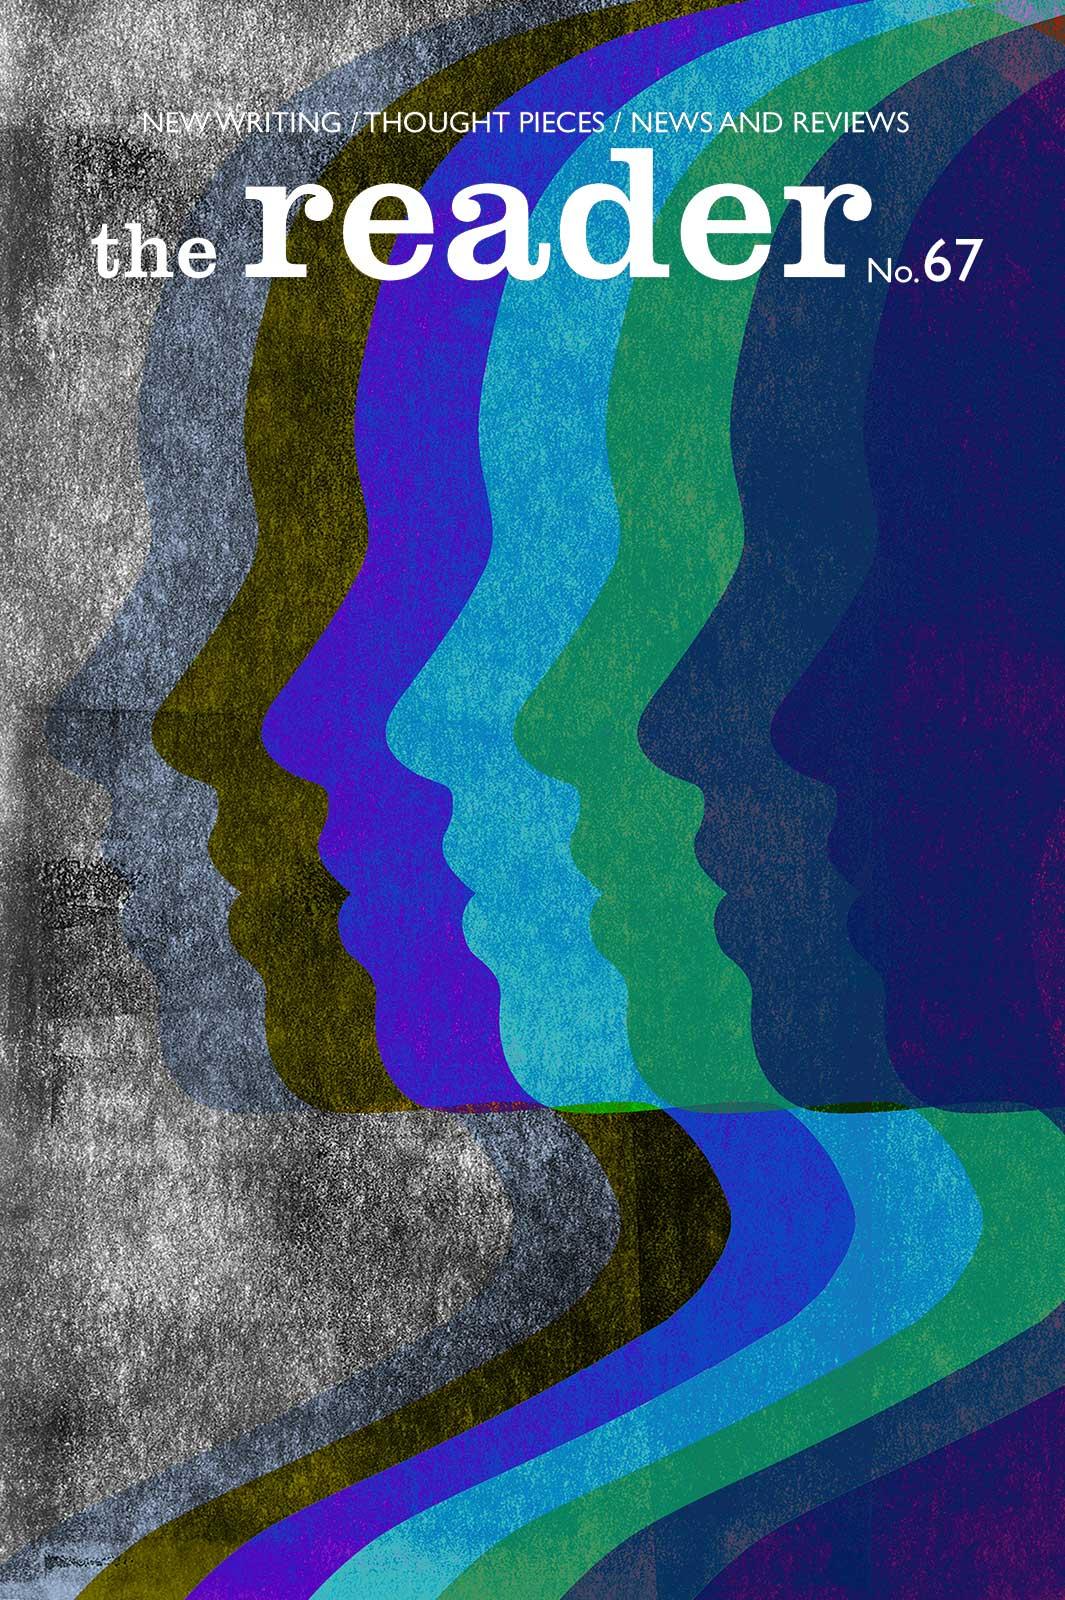 joemagee-Reader-Mag-Cover-Stigma.jpg